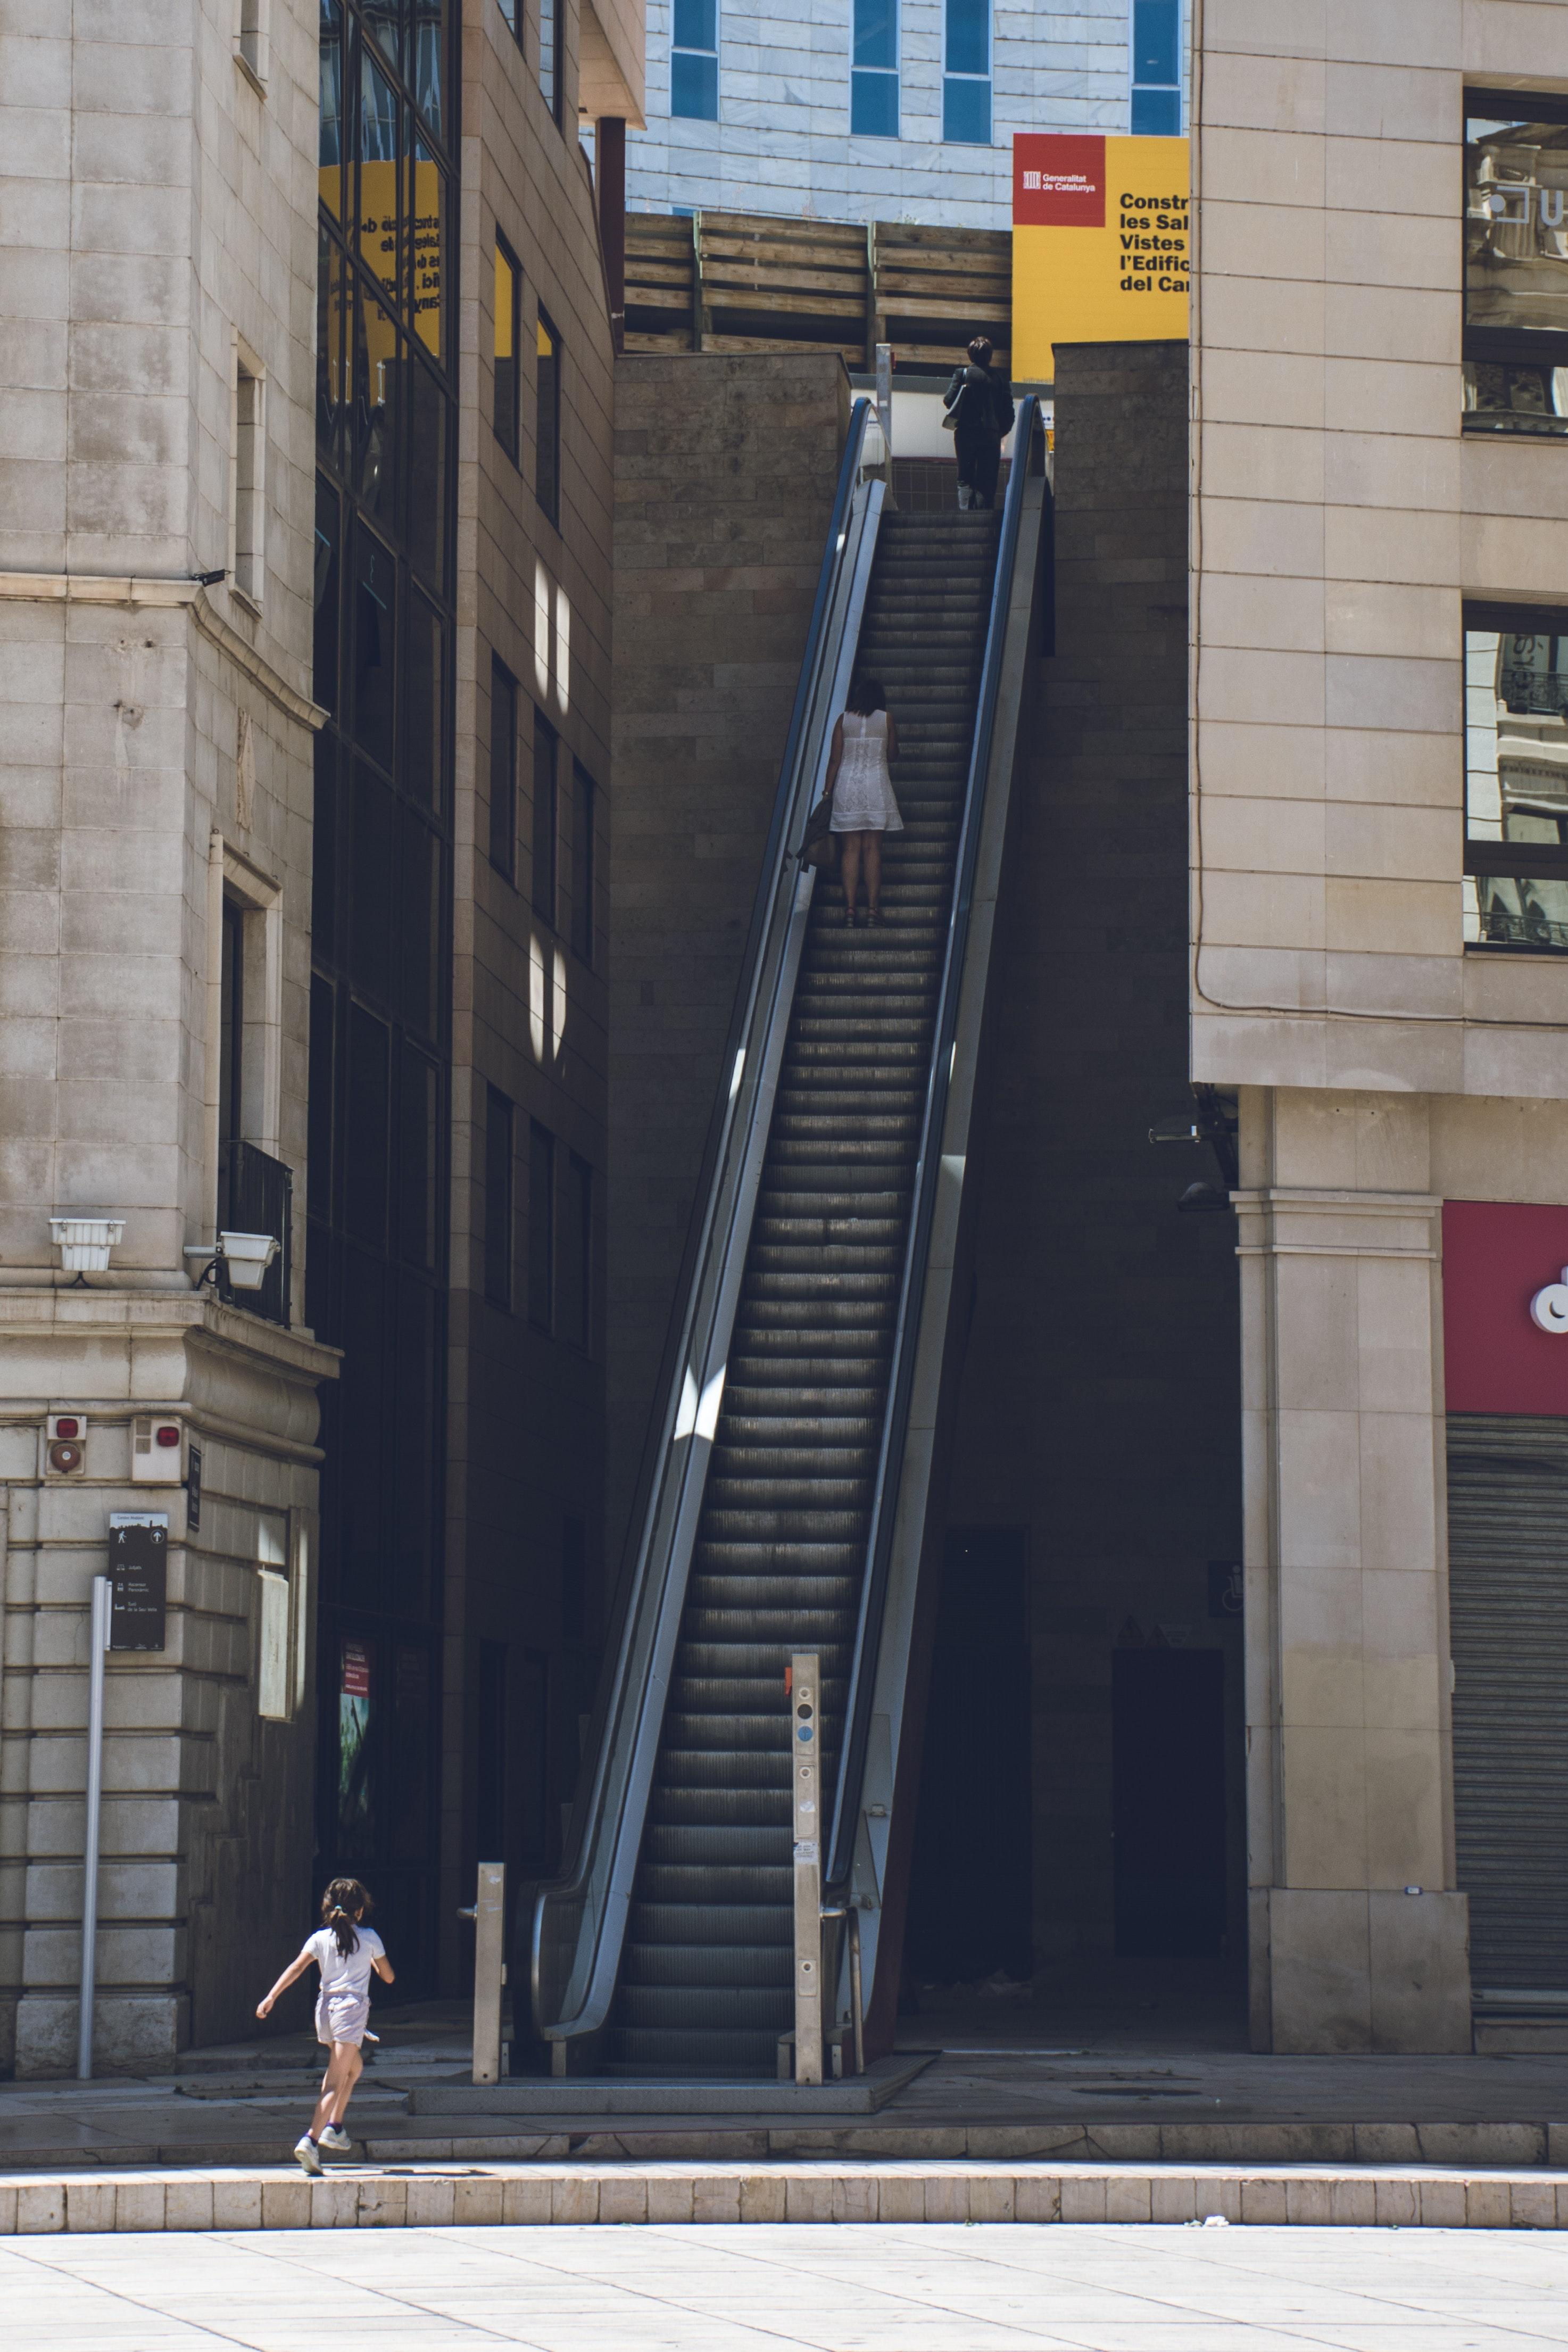 Girl Walking Towards the Escalator, Kid, Travel, Town, Summer, HQ Photo